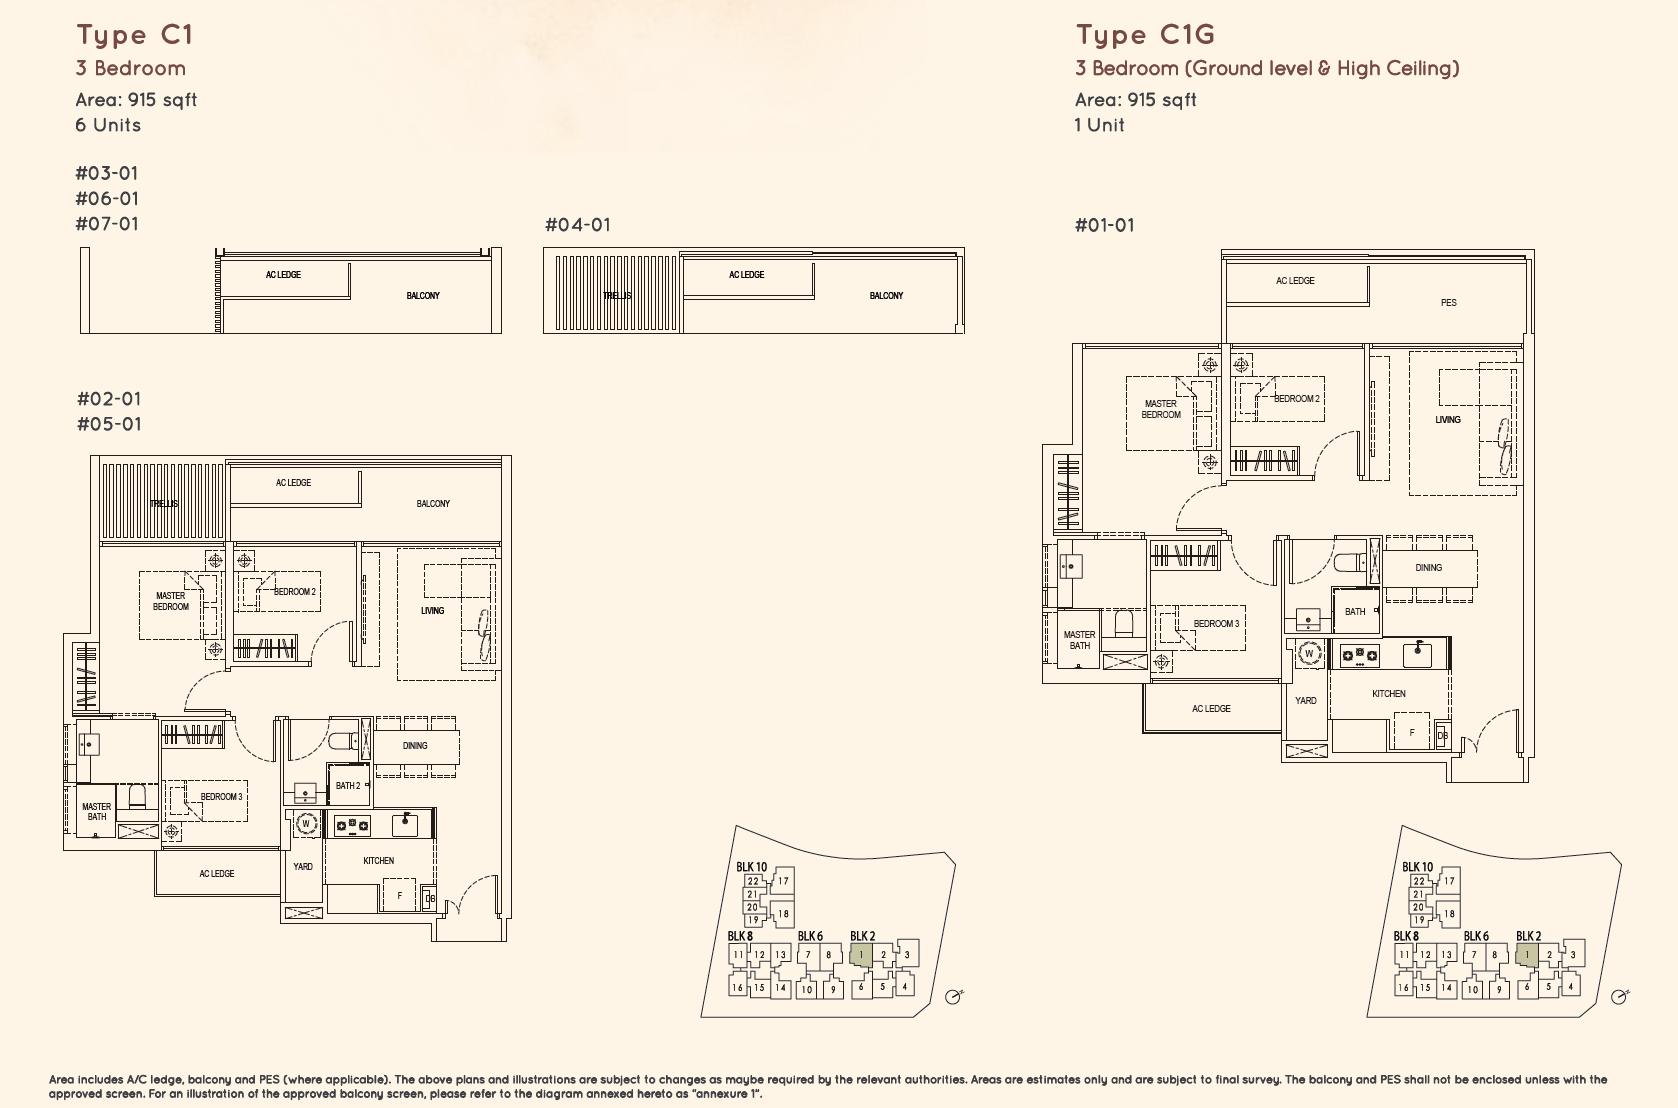 Kandis Residence 3 bedroom floor plan type C1